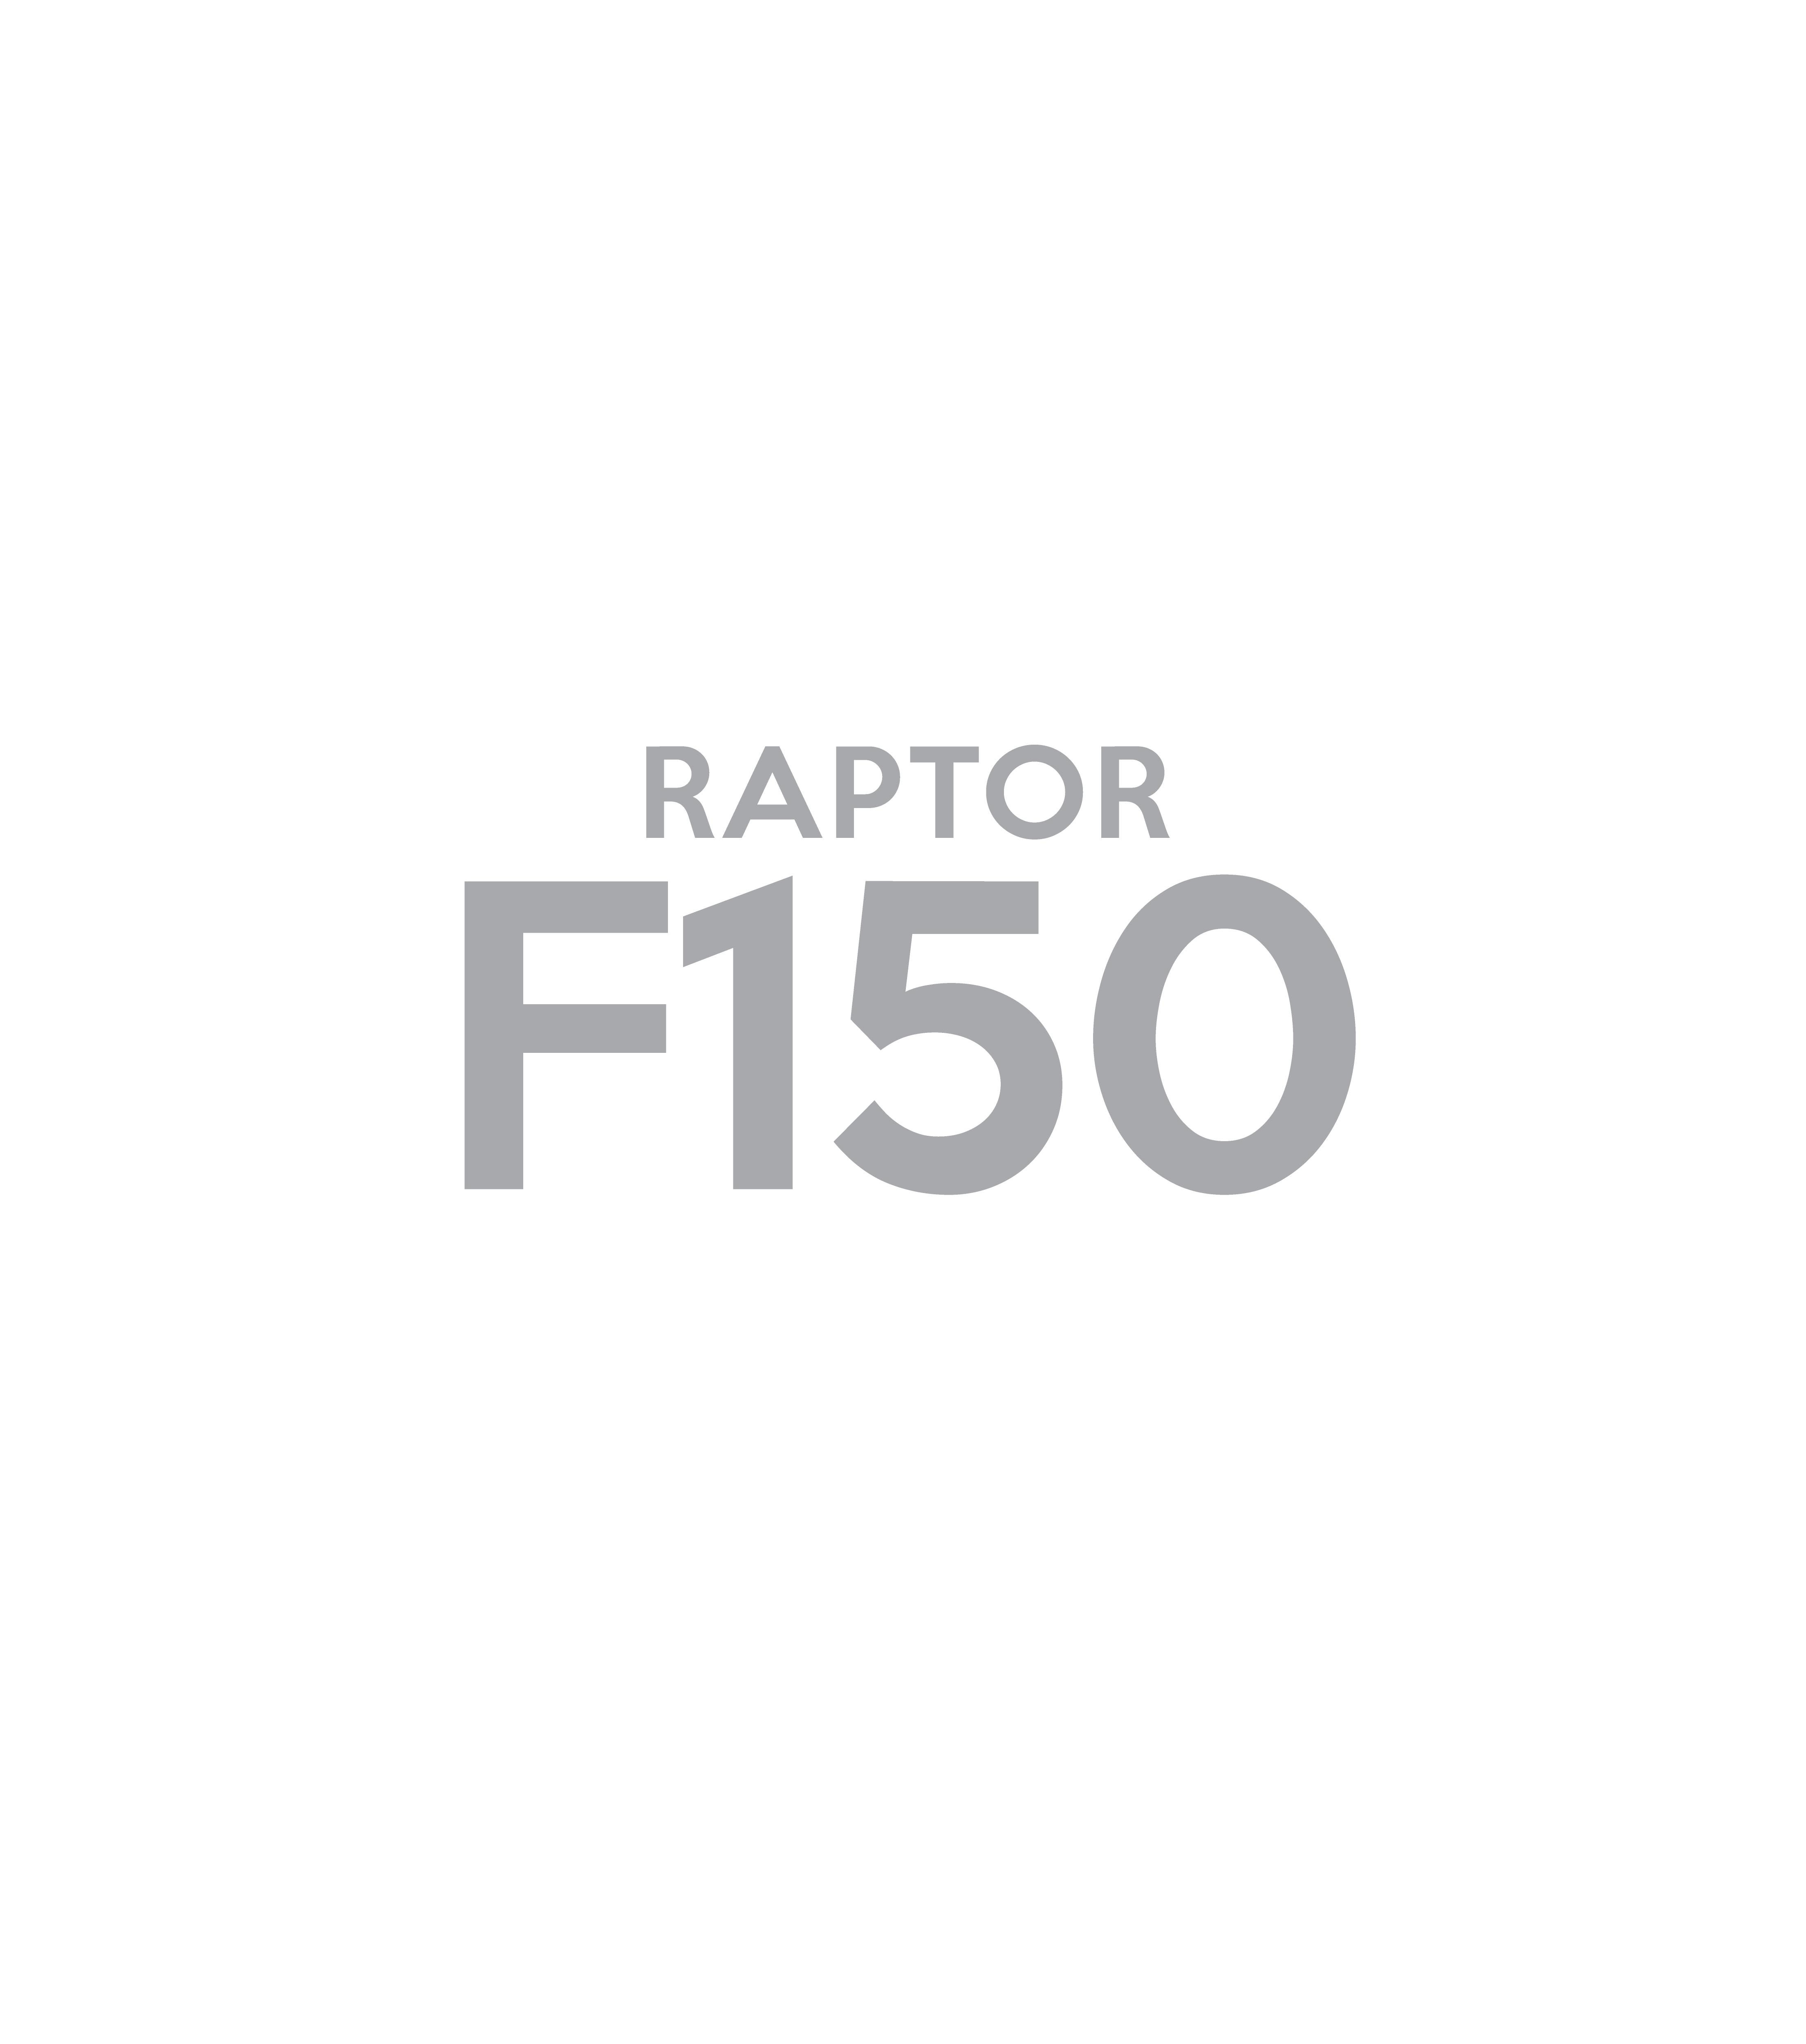 ford f150 raptor gobi gallery image